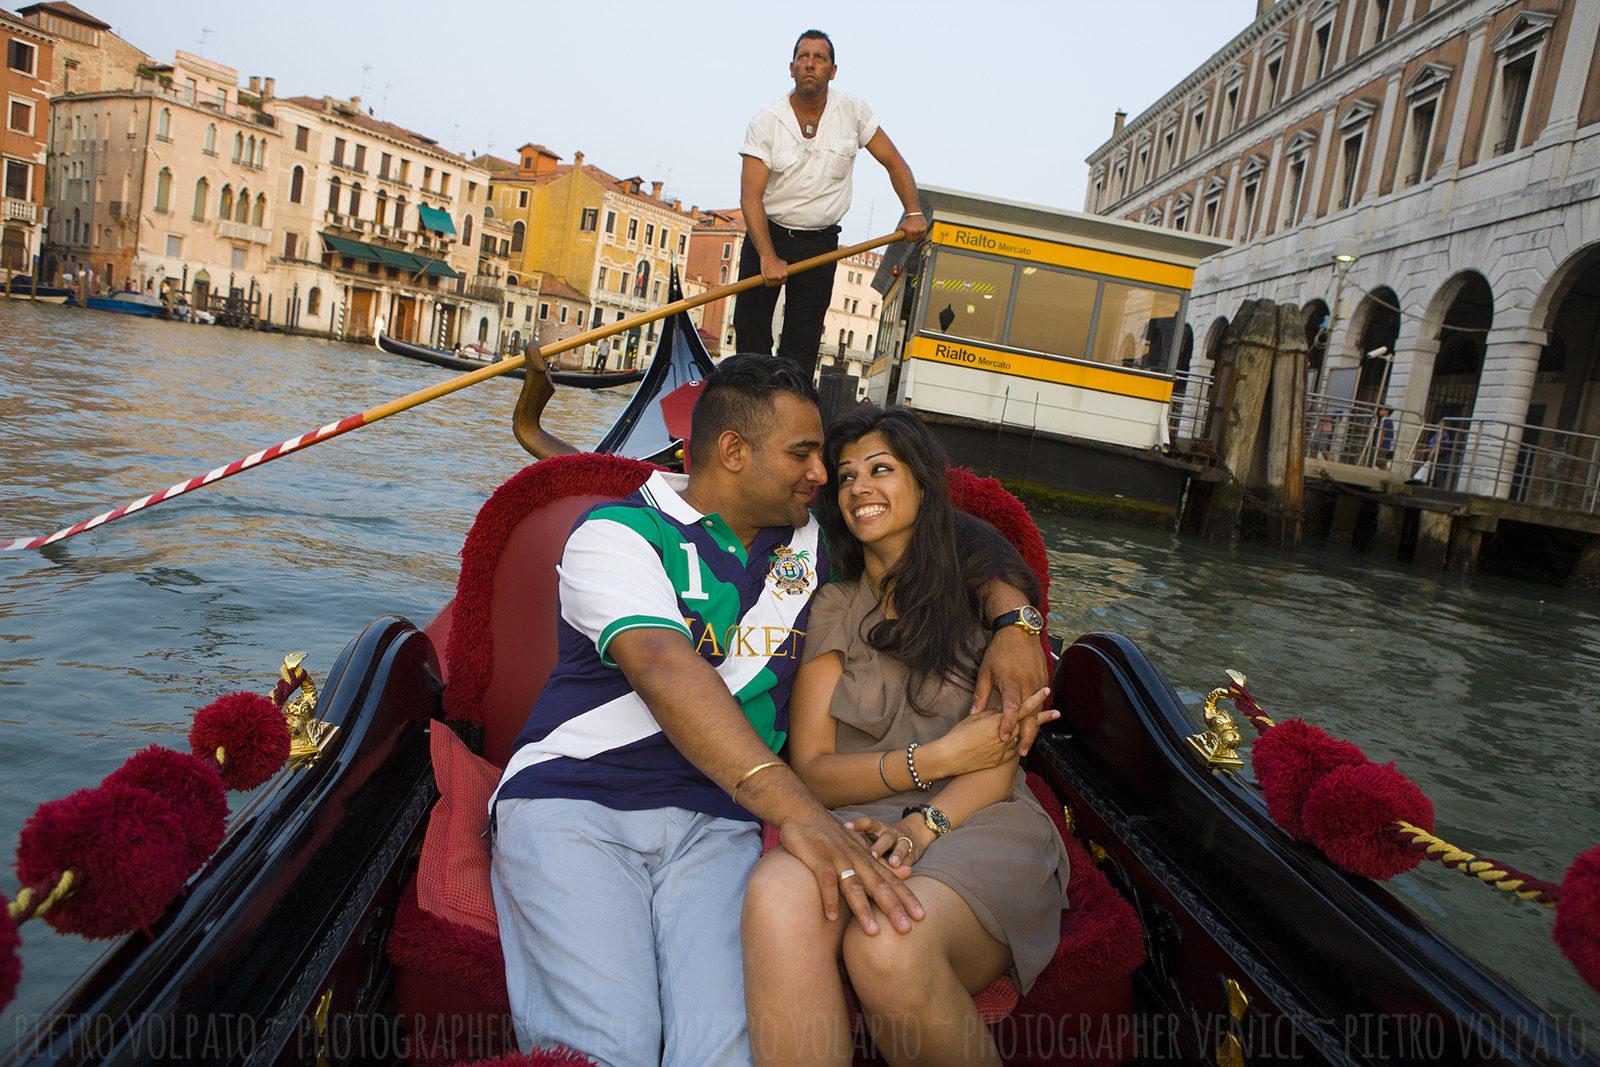 photographer-venice-honeymoon-photo-shoot-20130711_04